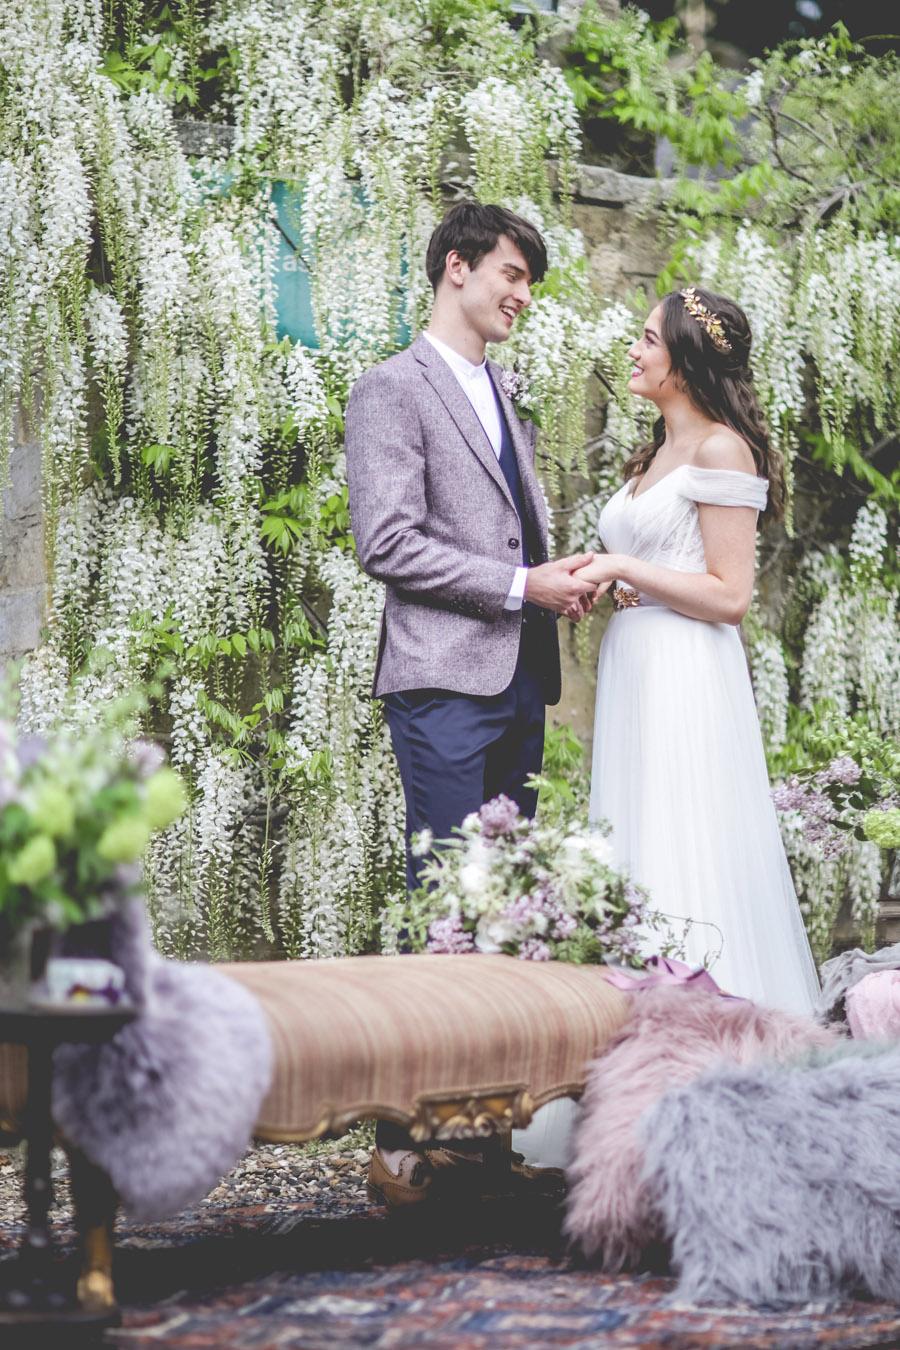 Eshott Hall wedding inspiration, credit Sean Elliott Photography (8)